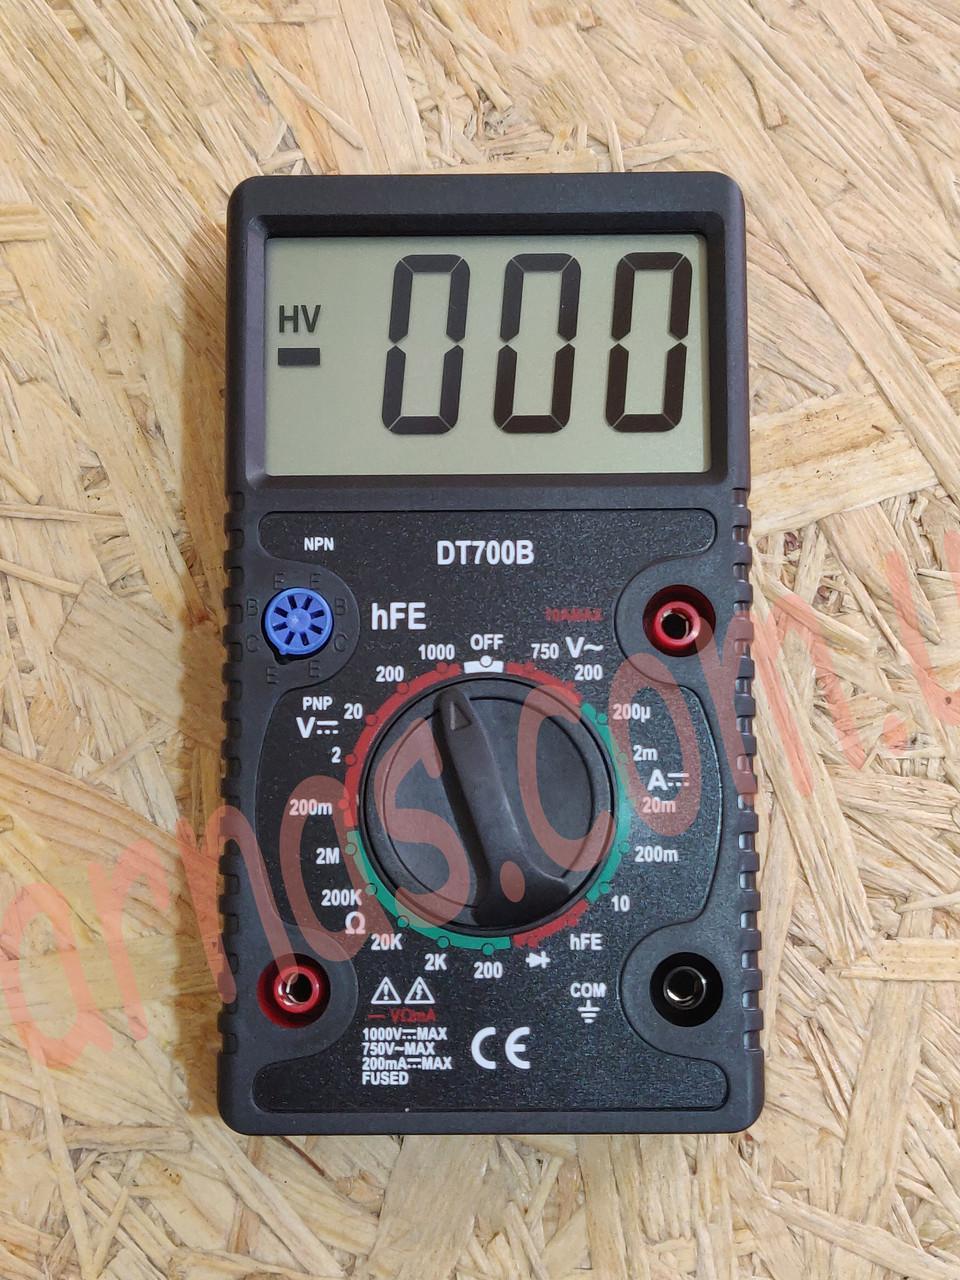 Мультиметр (тестер) DT700B цифровой